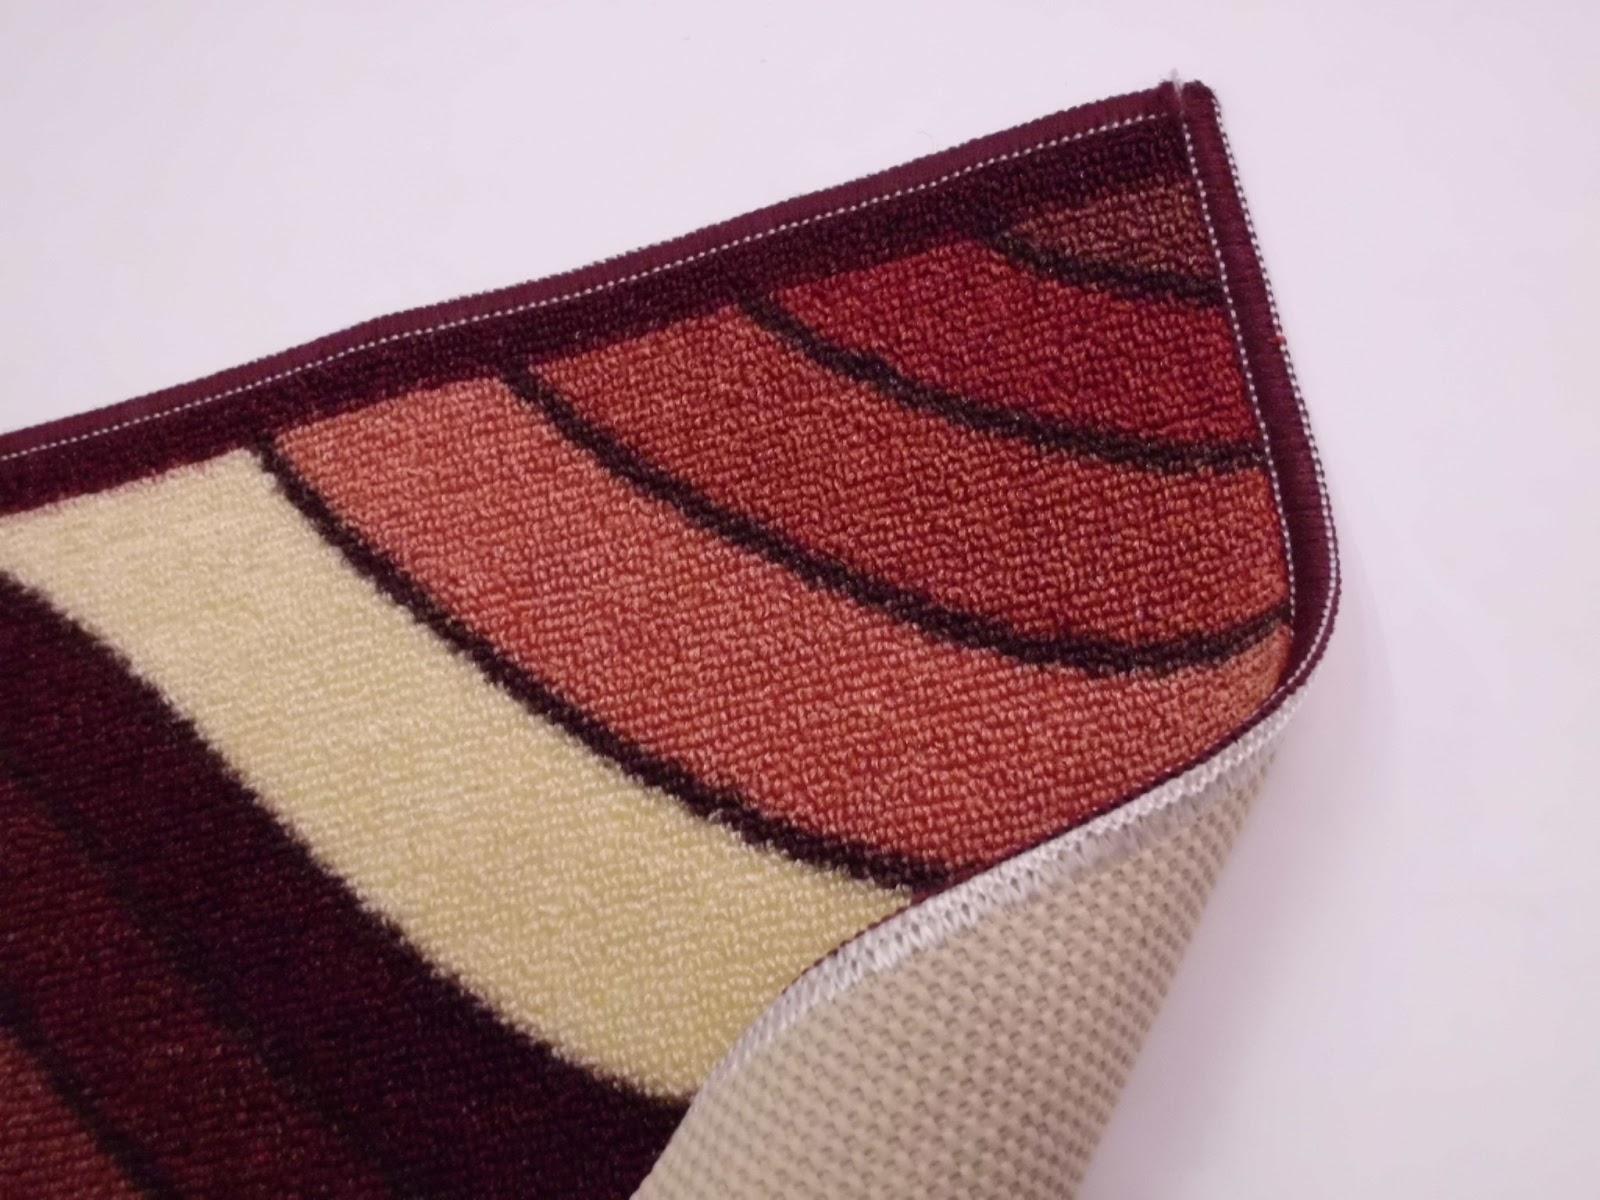 Tappeti moderni camera da letto - Tappeti in lana moderni ...